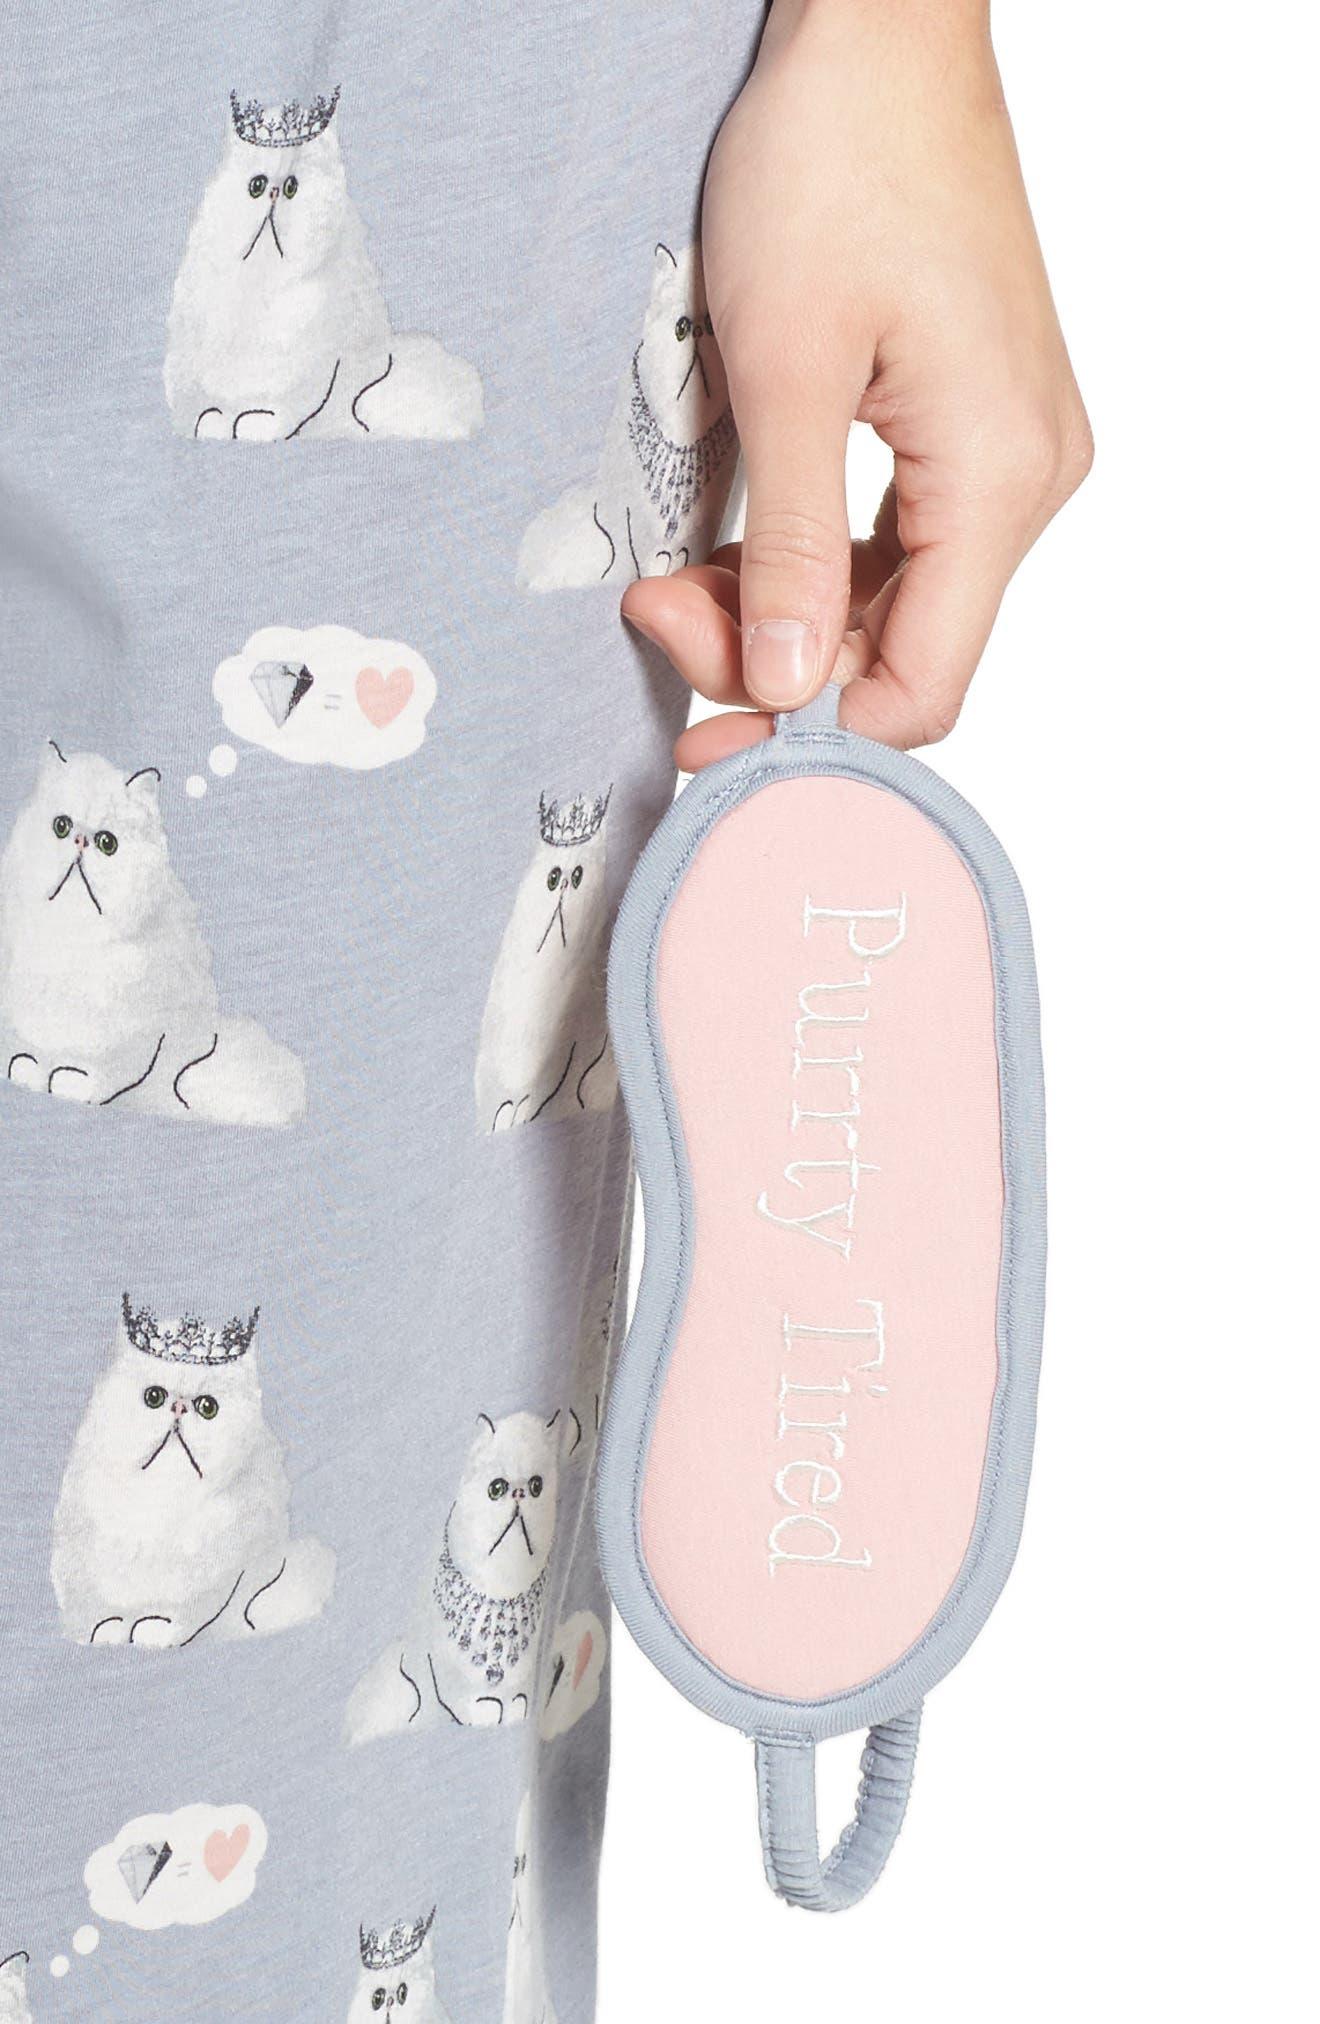 Playful Print Pajamas & Eye Mask,                             Alternate thumbnail 4, color,                             065